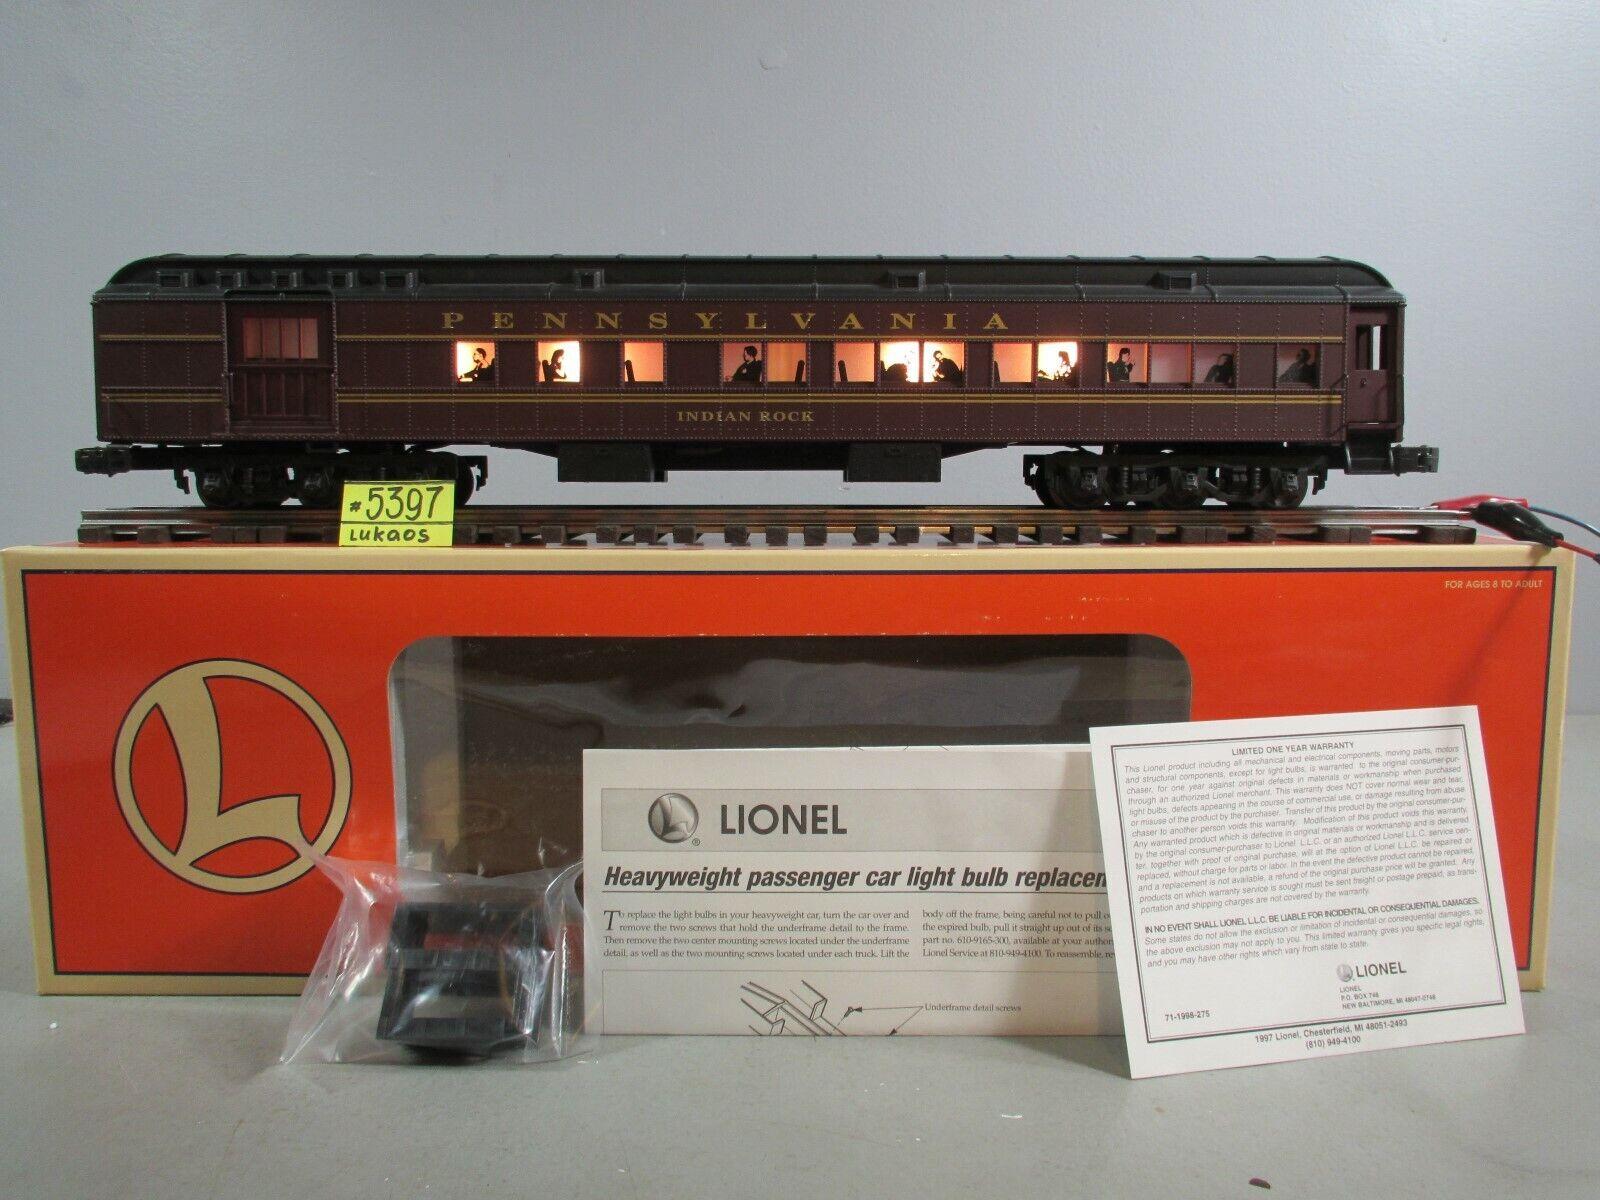 venta con alto descuento Coche Lionel Combo Pennsylvania    Indian Rock  6-39009 nuevo O.B.  comprar marca